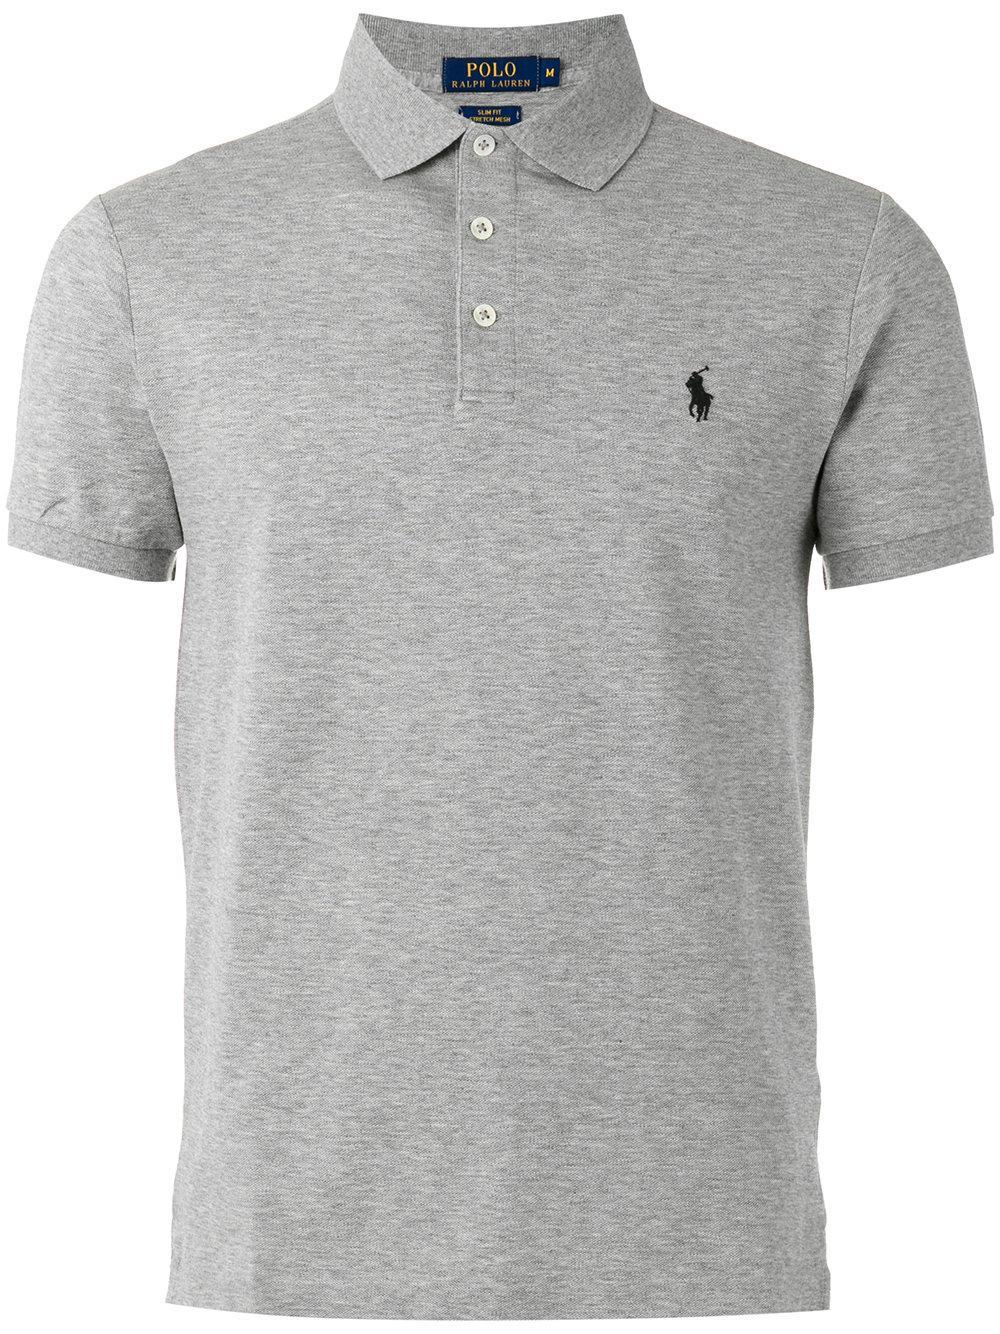 Polo ralph lauren embroidered logo polo shirt in gray for men lyst for Ralph lauren logo shirt